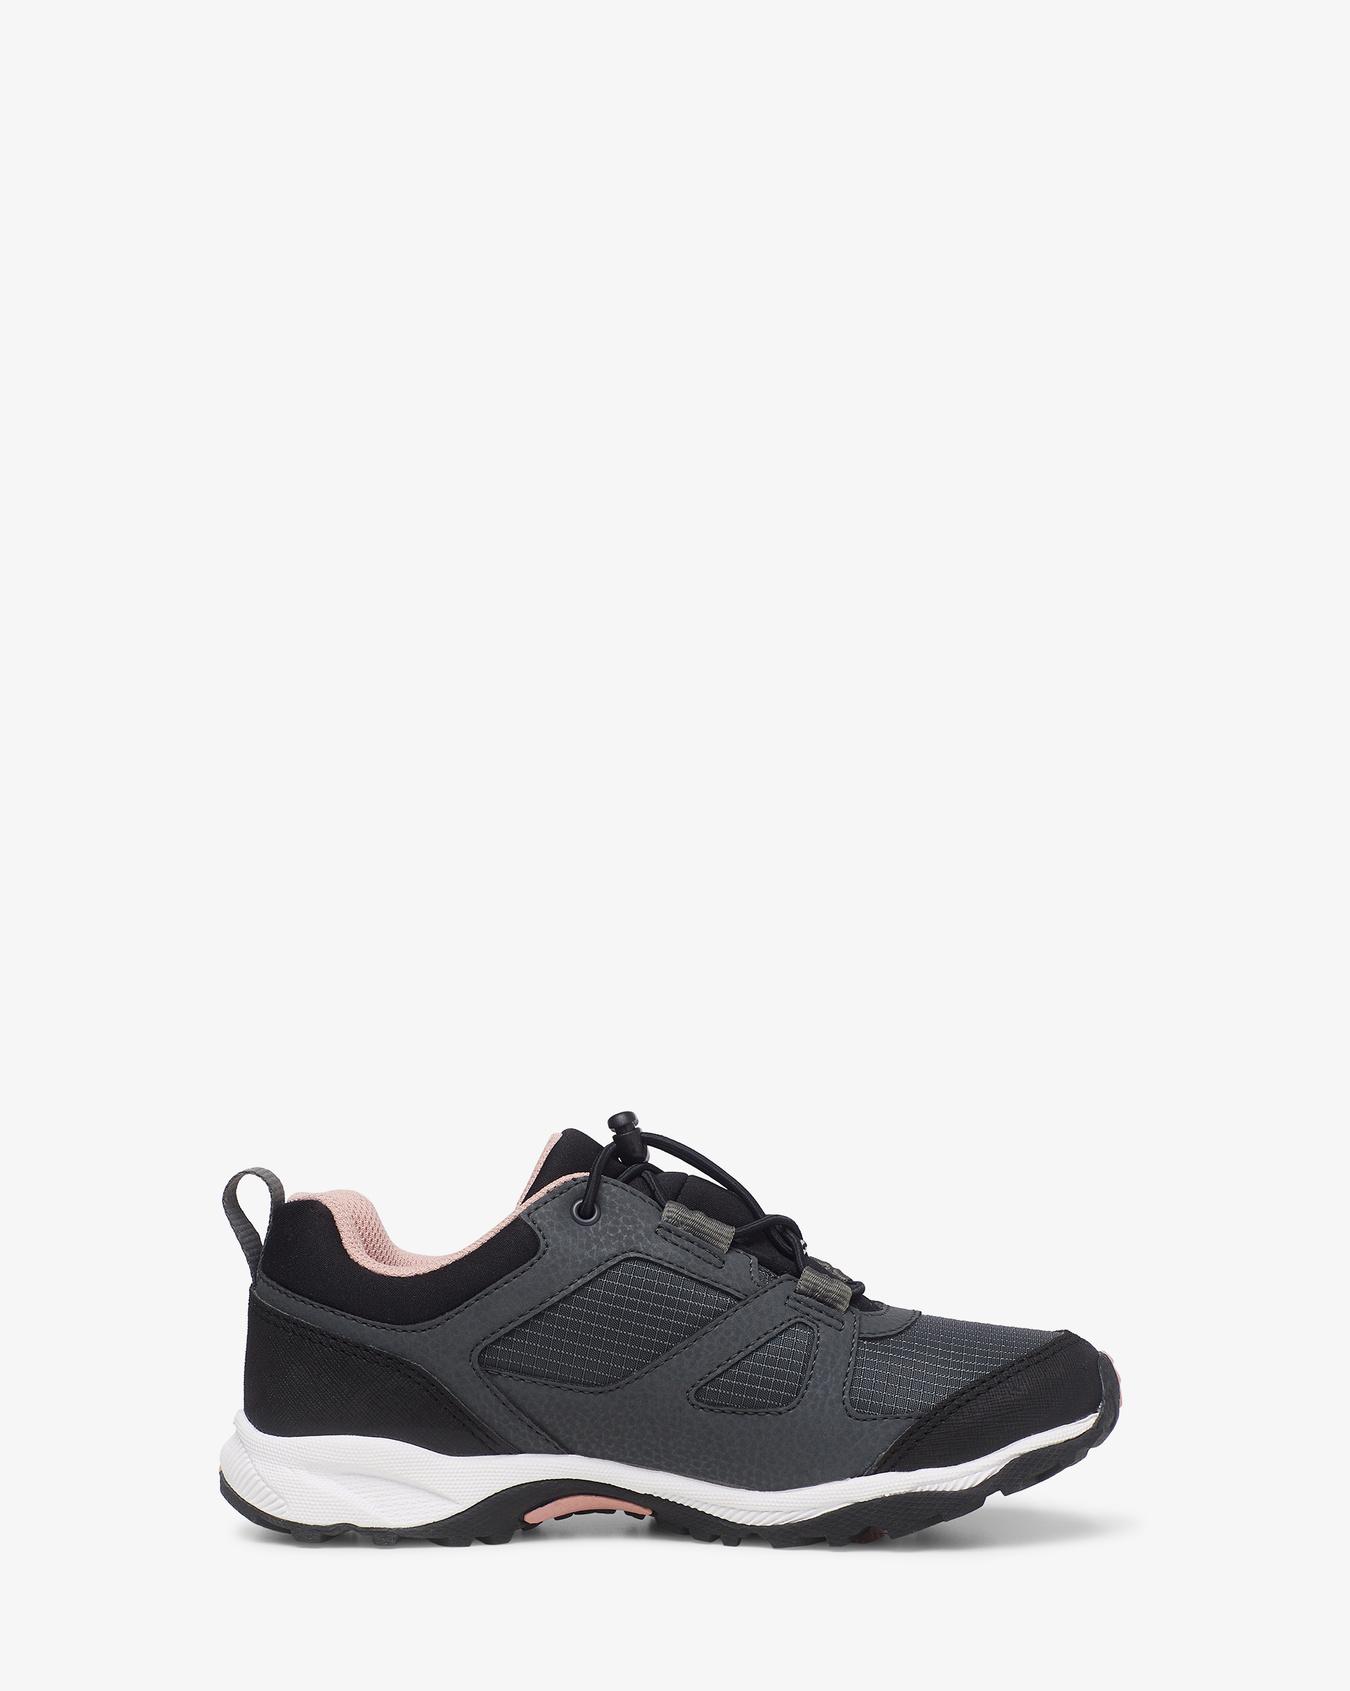 Nator GTX Grey Sneaker